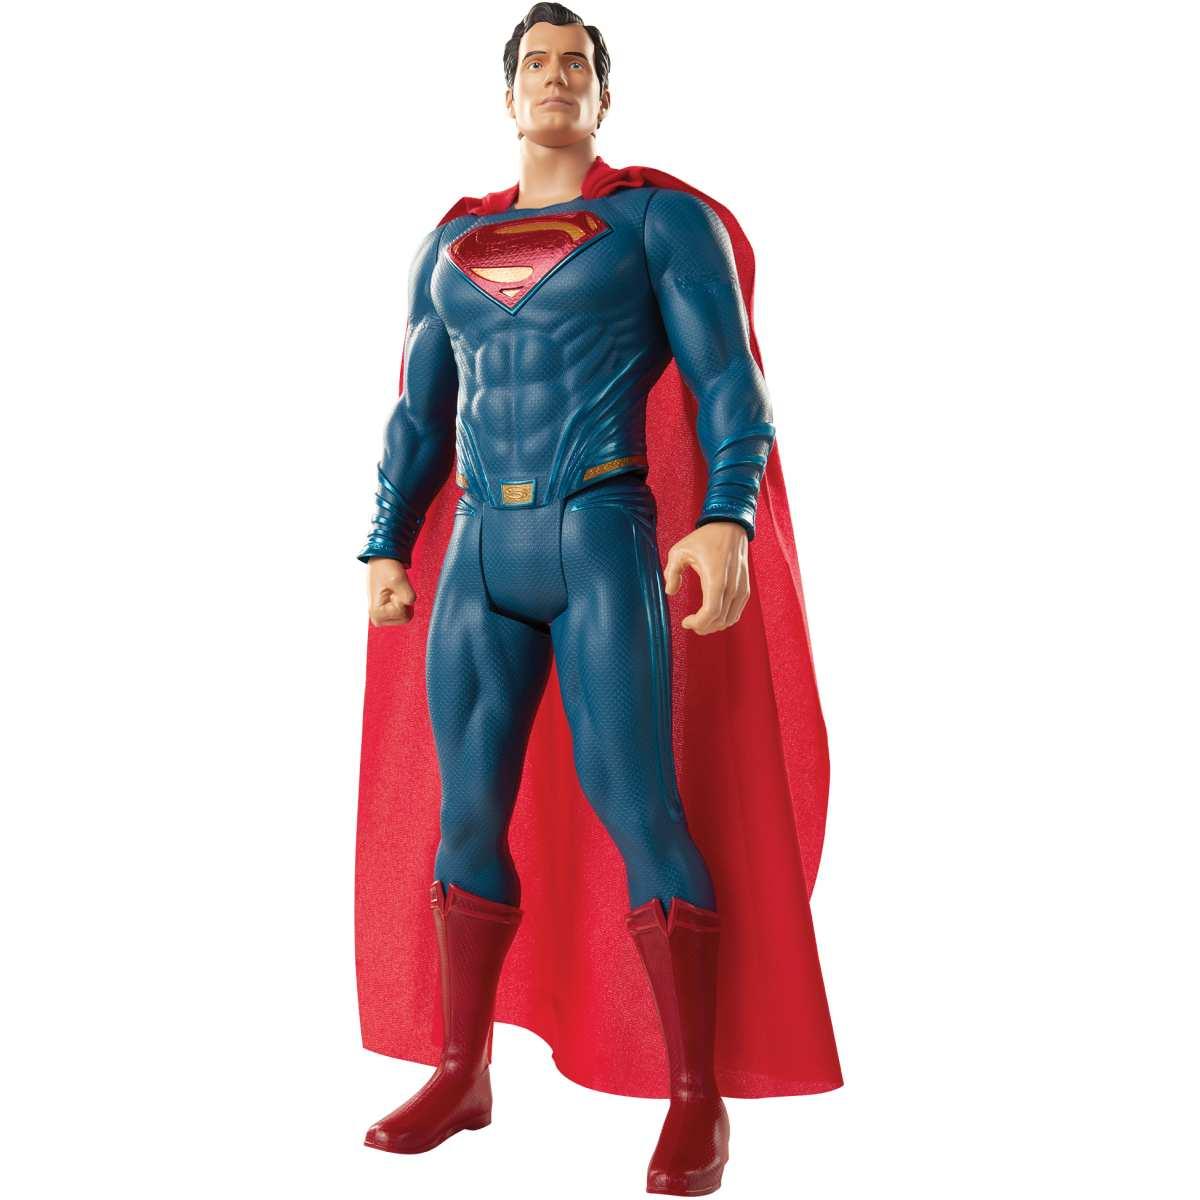 Boneco Superman Liga Justica 50cm - Mimo